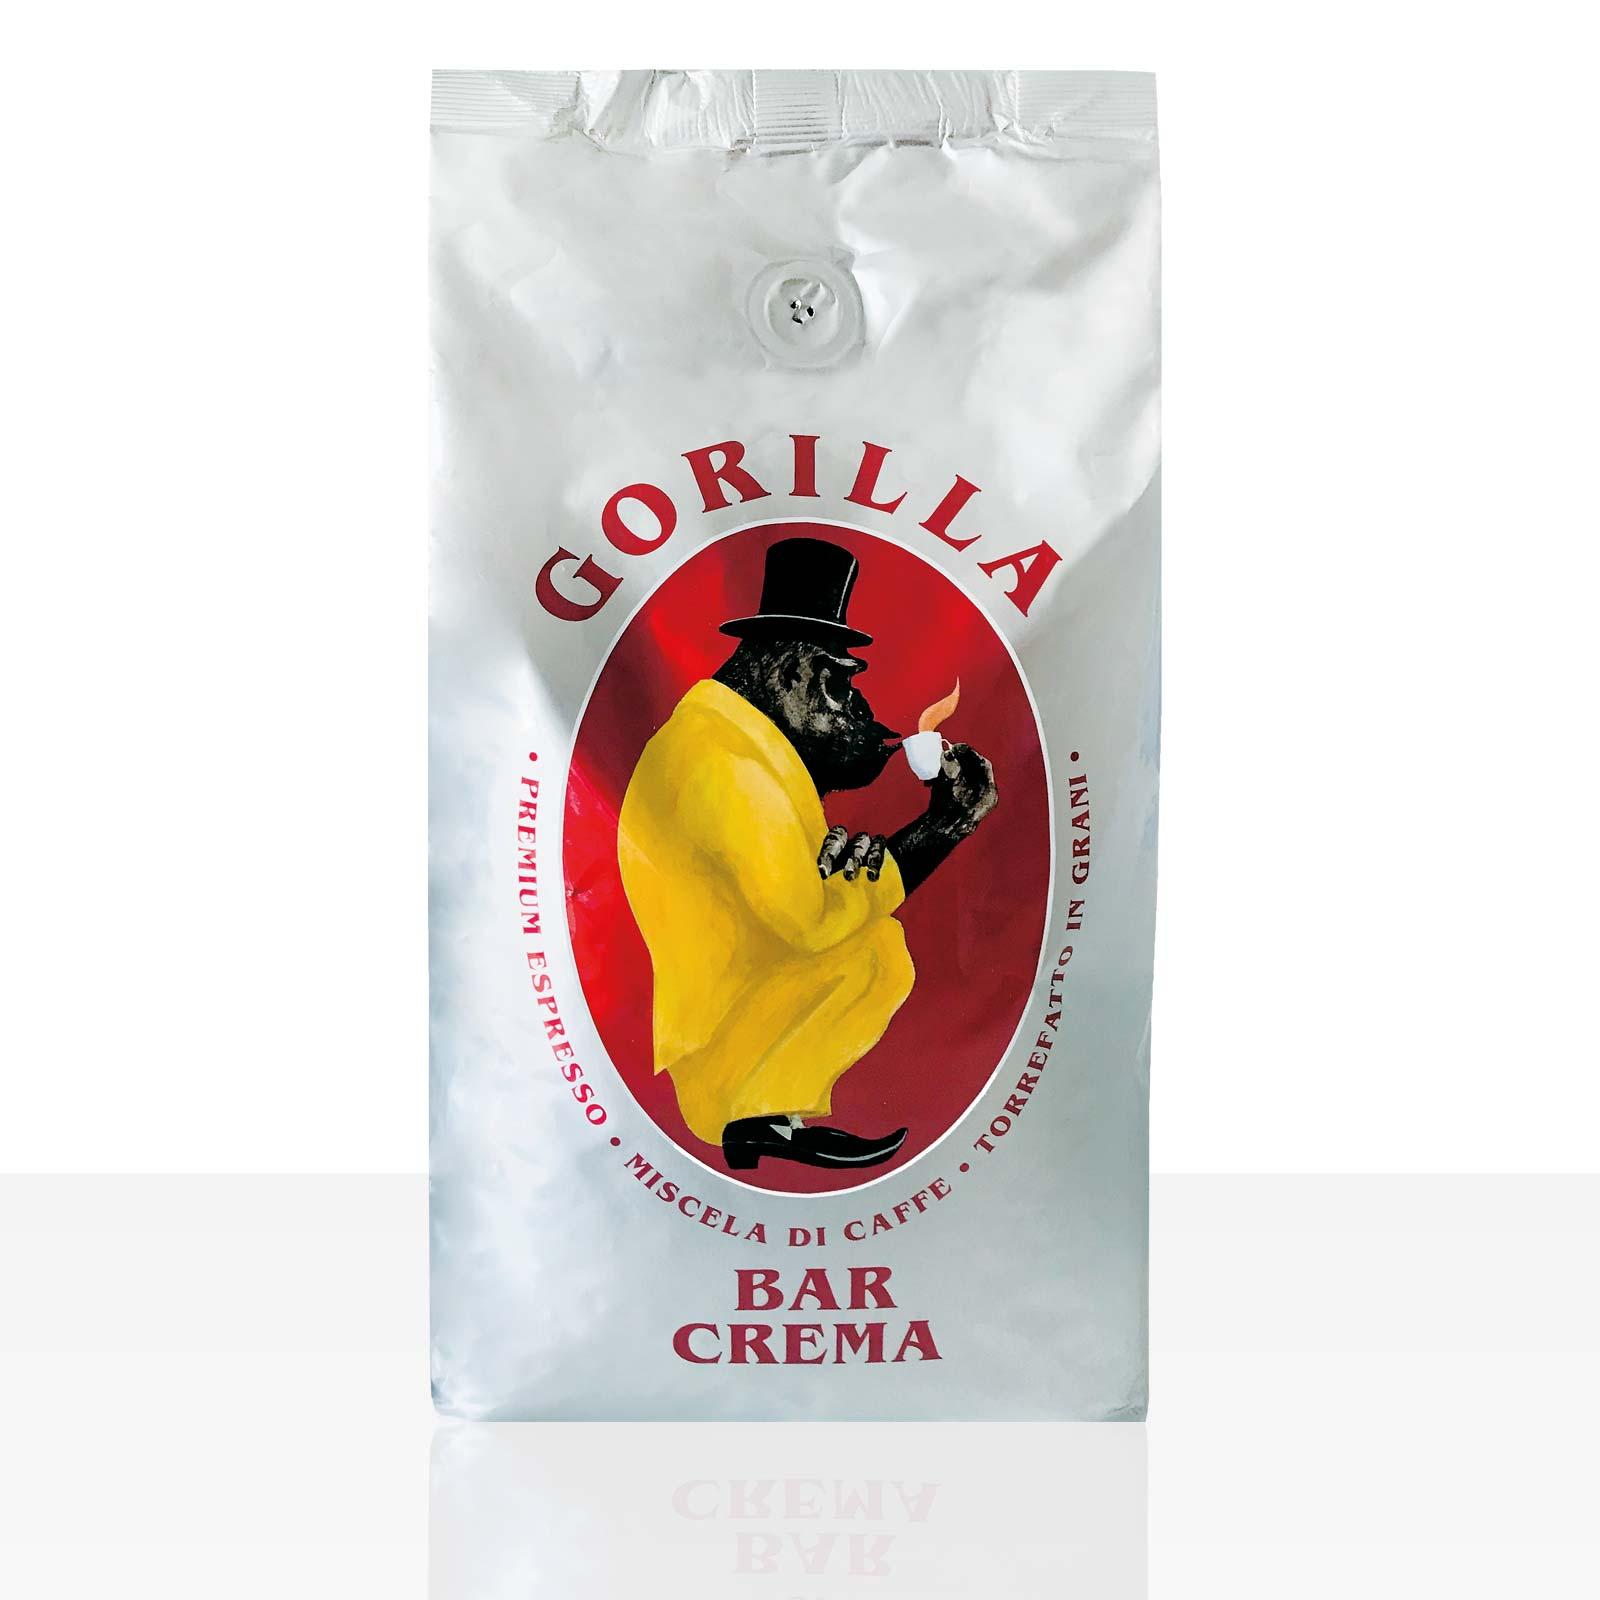 Gorilla Espresso Bar Crema 1kg Kaffee ganze Bohne